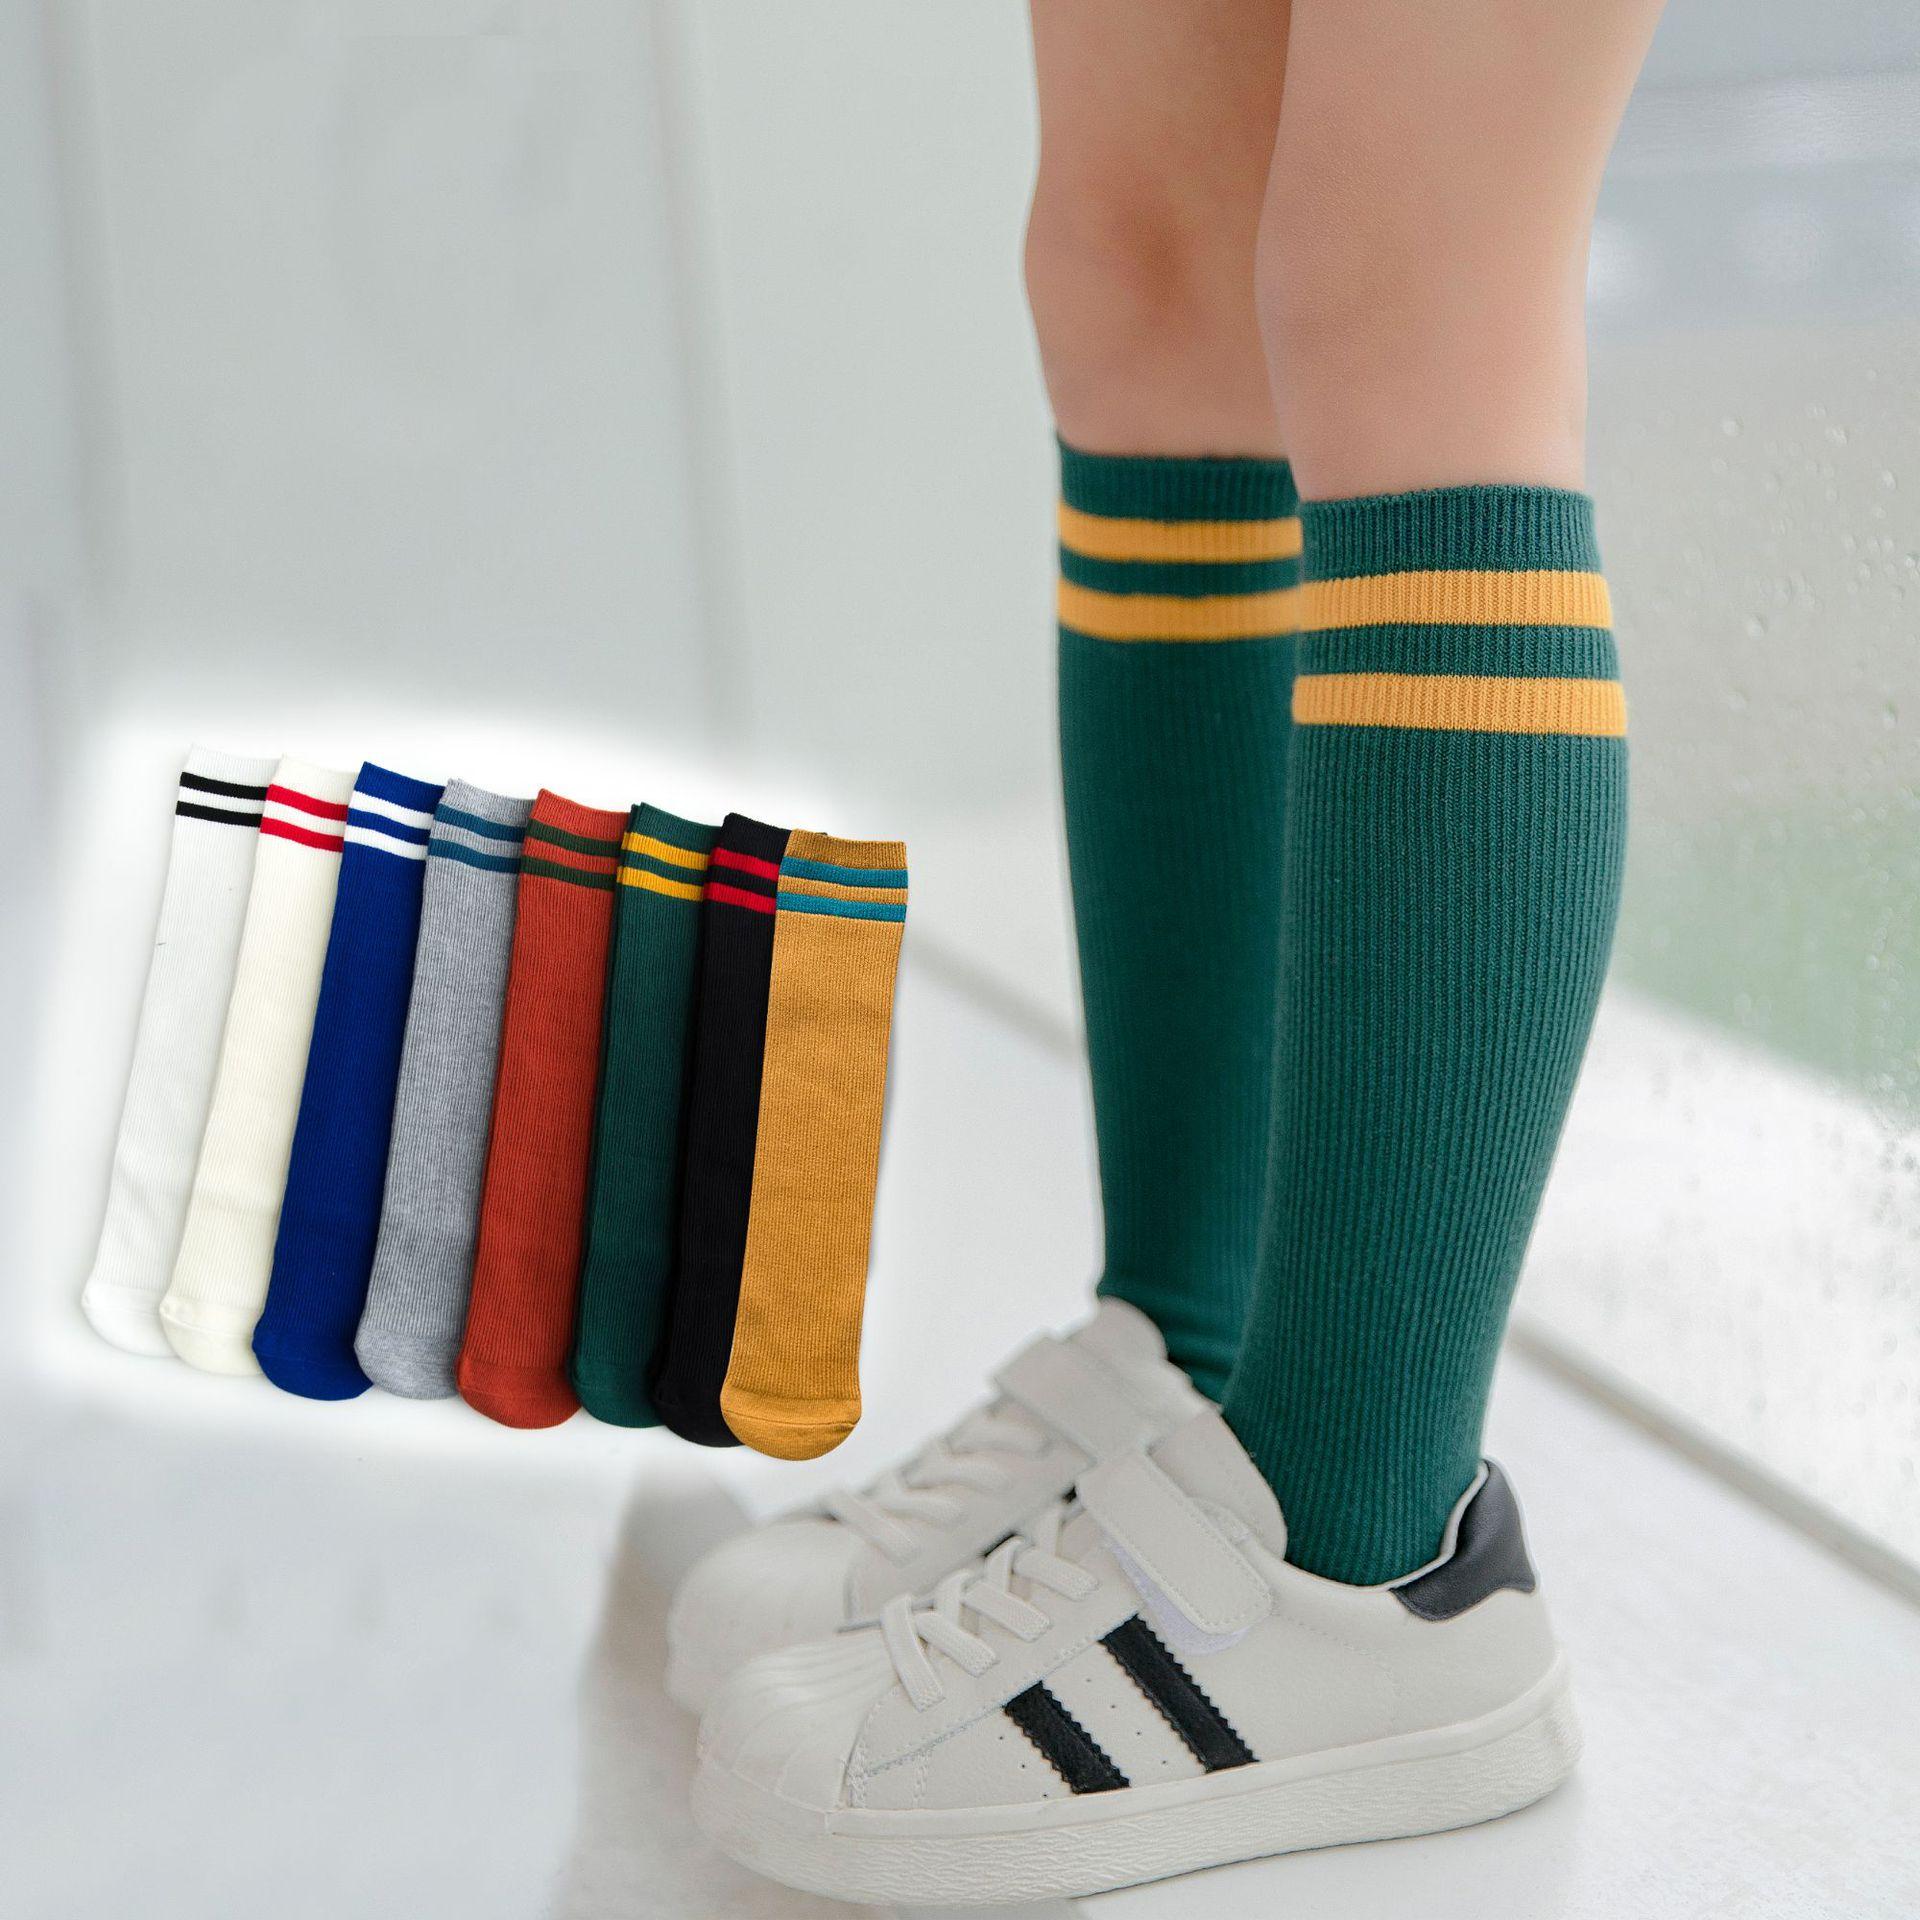 Small Alpaca Spring New Style Cotton Children Parallel Bars College Style Tube Socks Men And Women Children Football Socks